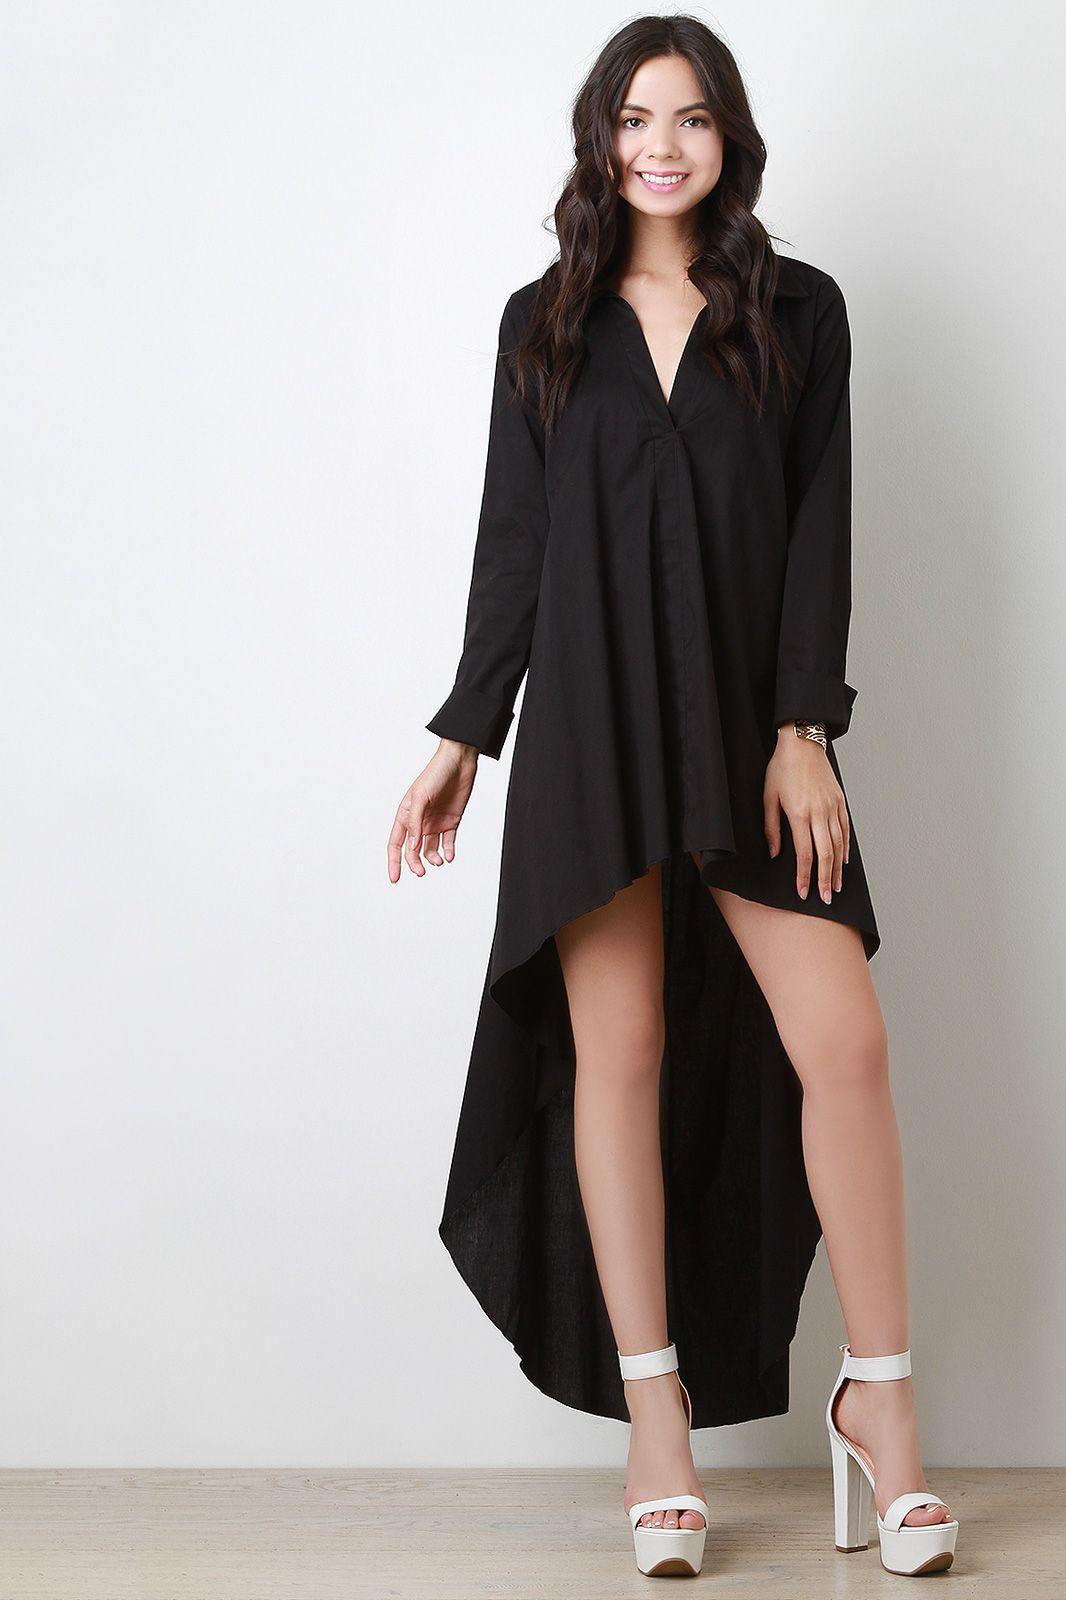 Back Cutout V Neck Long Sleeves High Low Dress Long Sleeve High Low Dress High Low Dress Dresses [ 1600 x 1066 Pixel ]